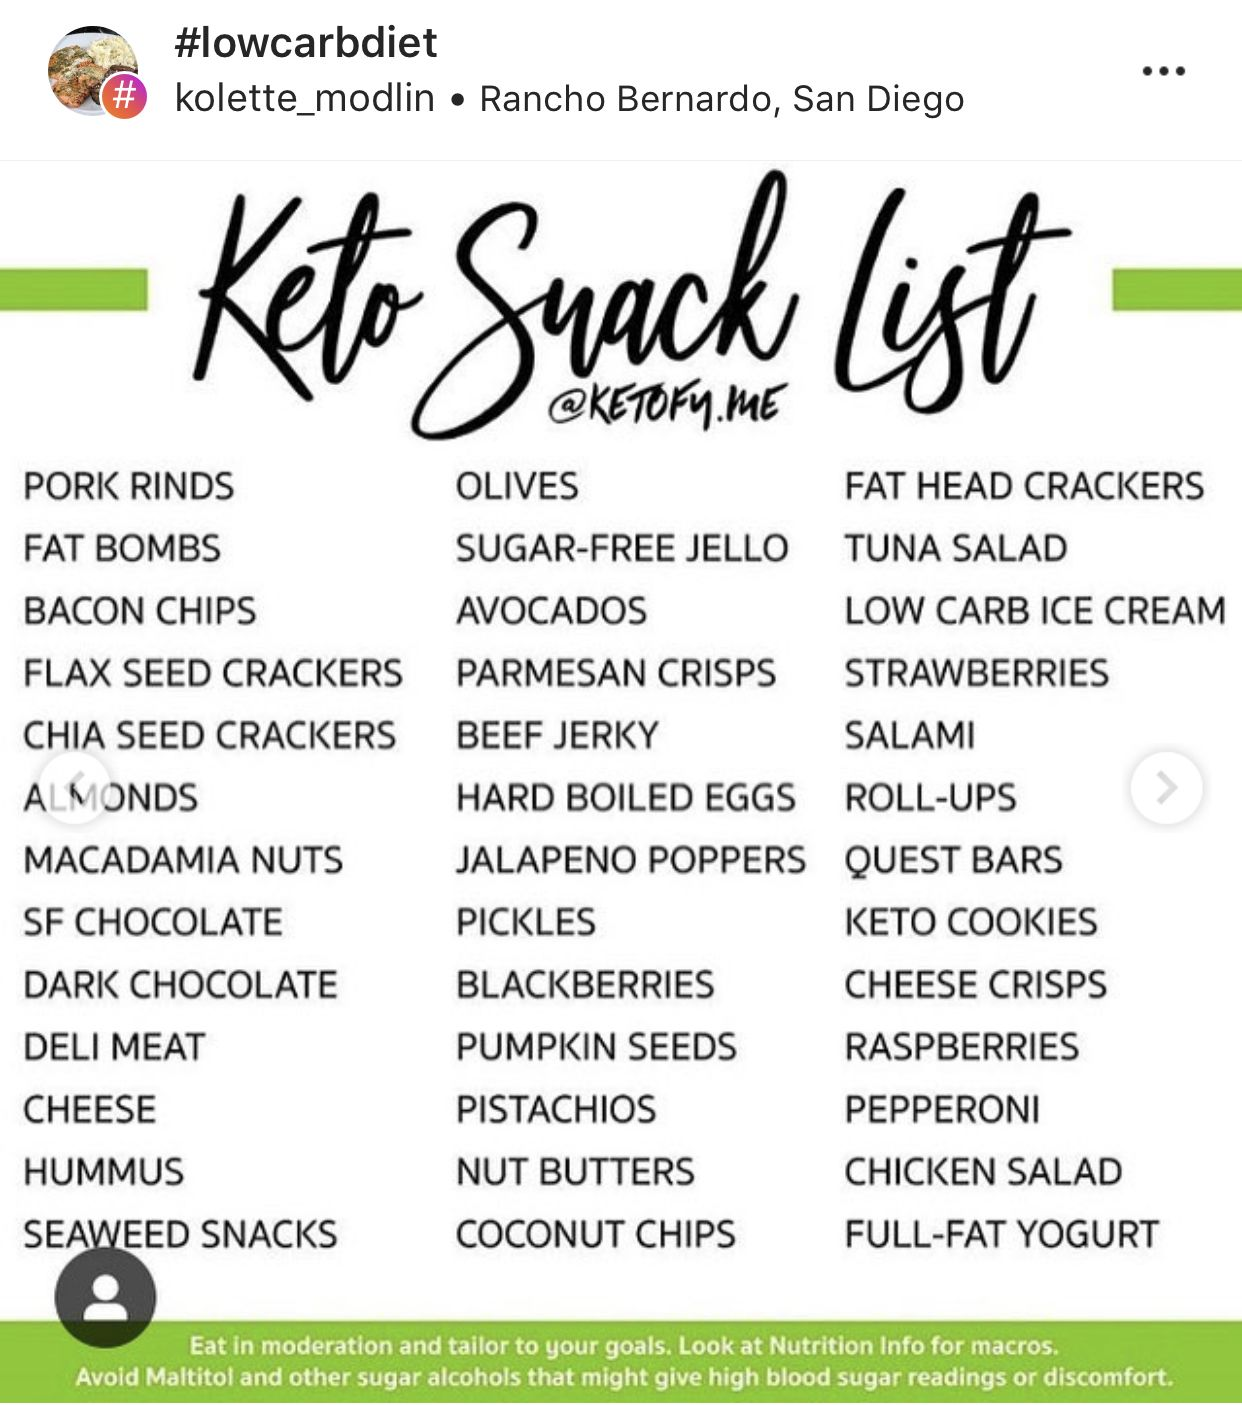 Pin By Cathy Phelan On Keto Keto Carbs Starting Keto Keto Diet Meal Plan